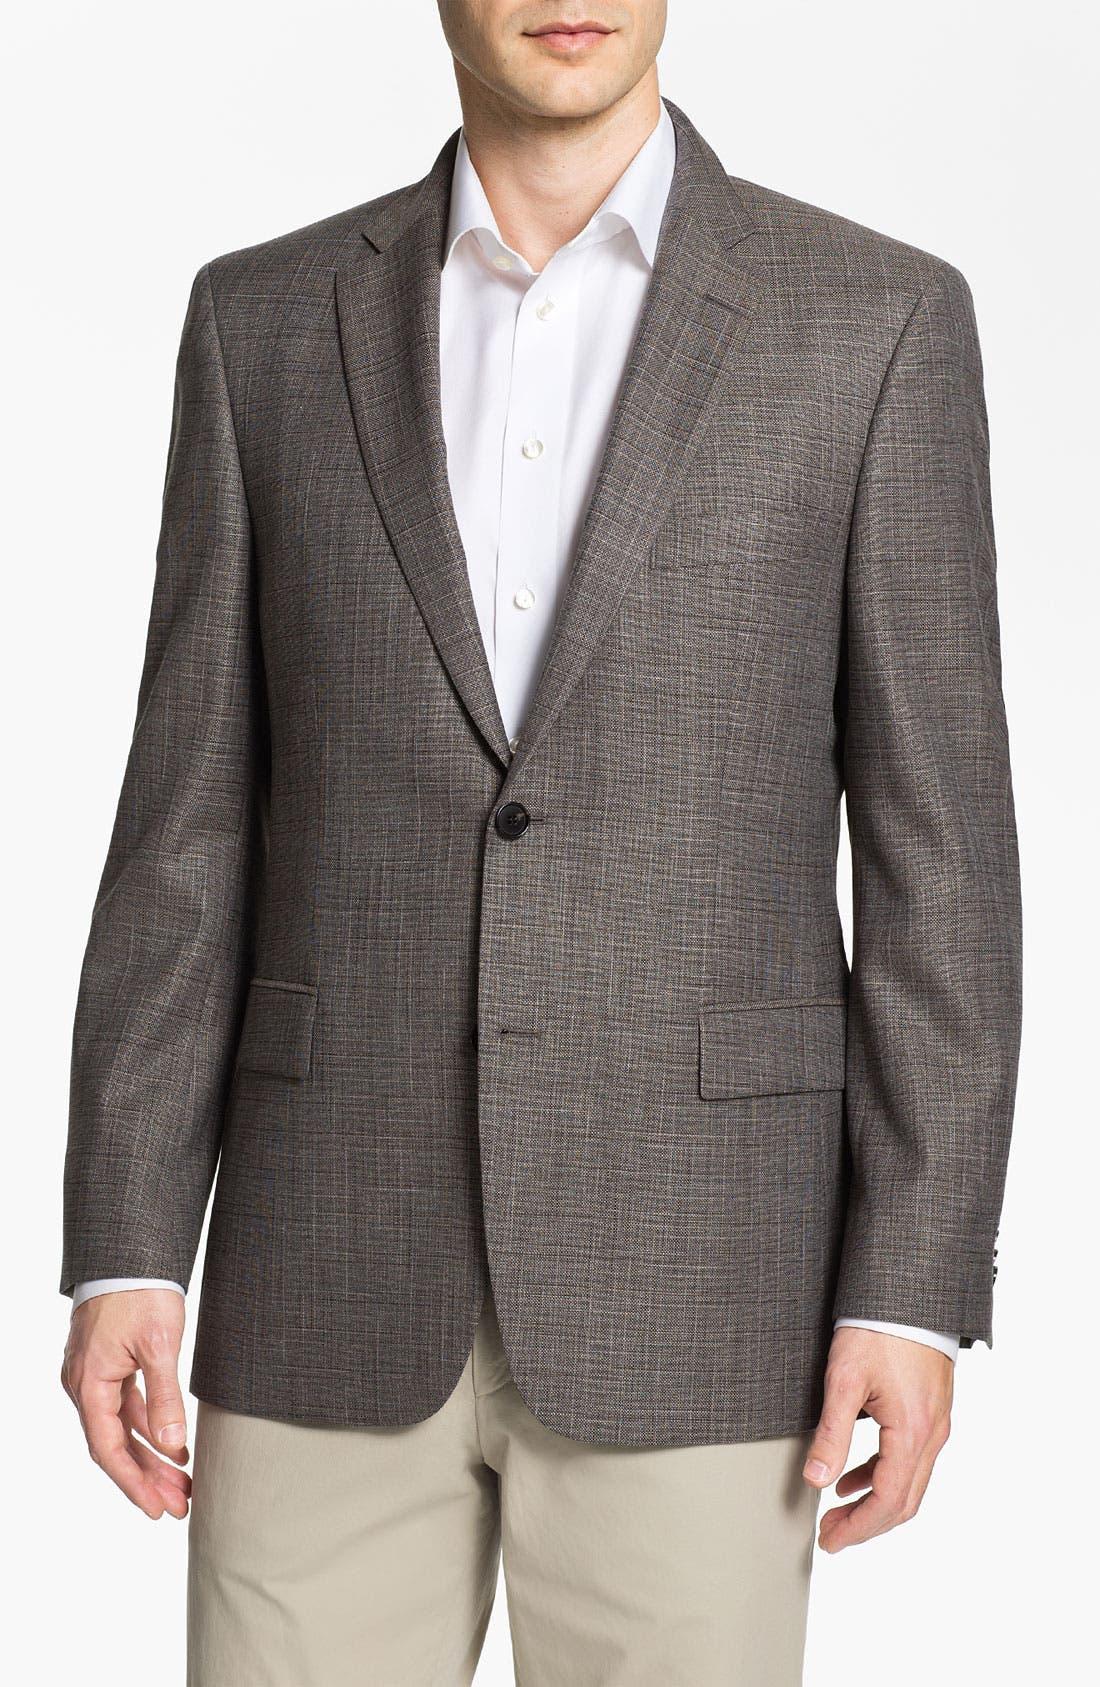 Alternate Image 1 Selected - BOSS Black 'Pasini' Wool Blend Sportcoat